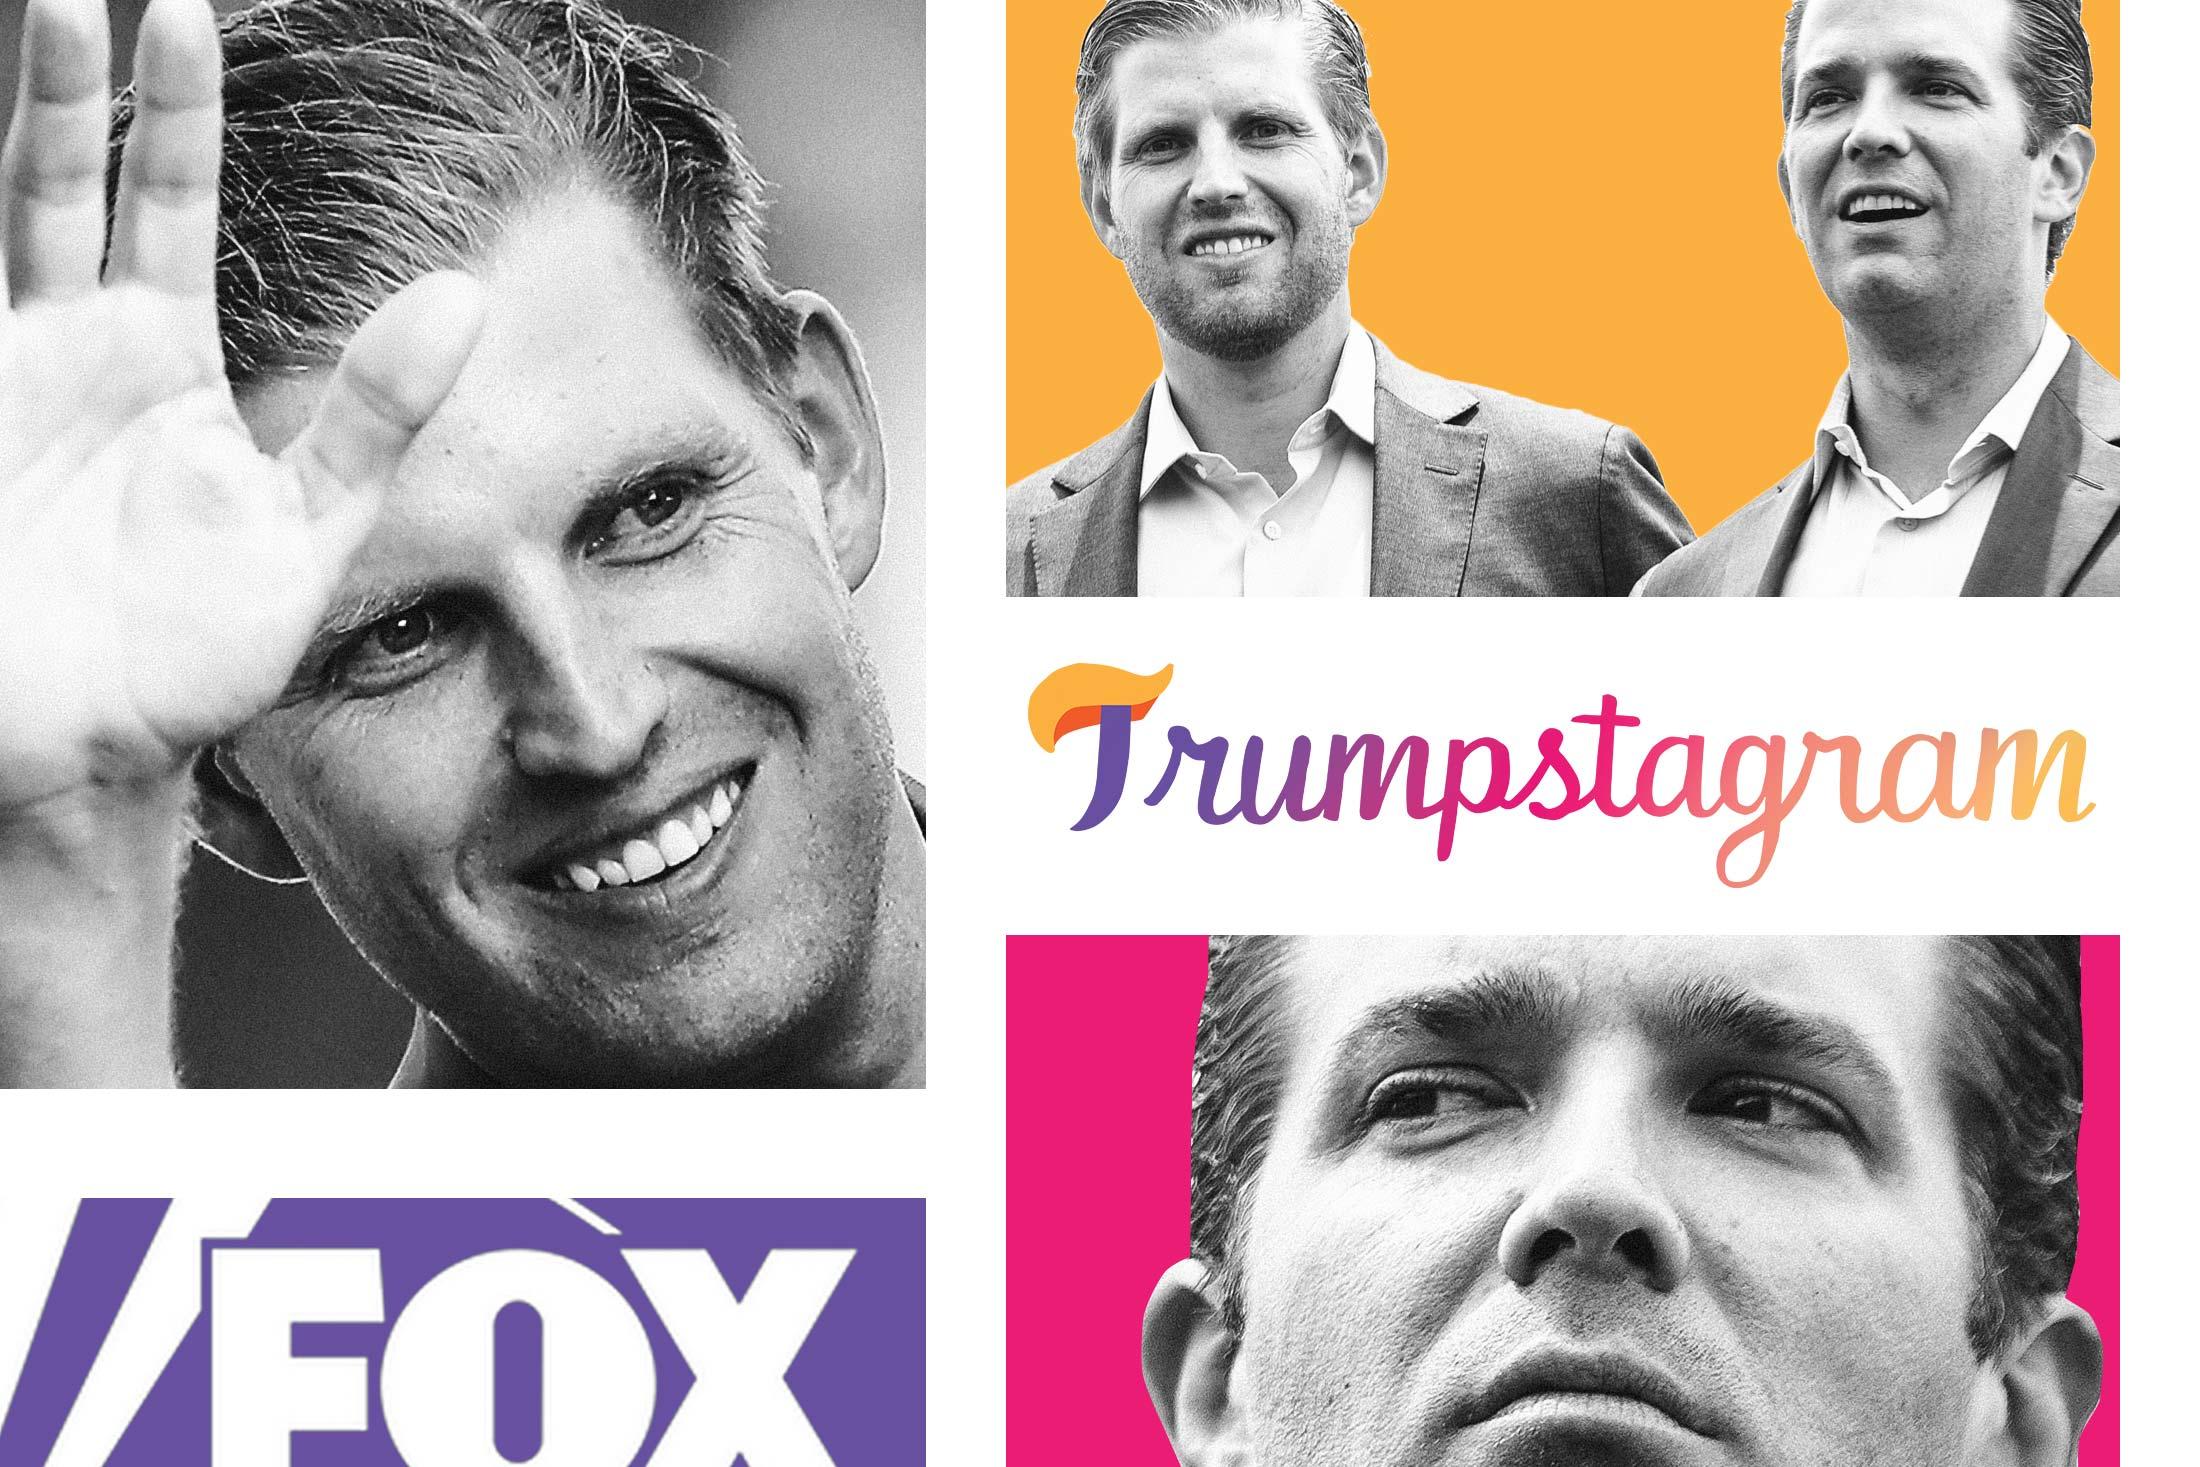 Eric Trump, Donald Trump Jr., Fox News logo, Trumpstagram.